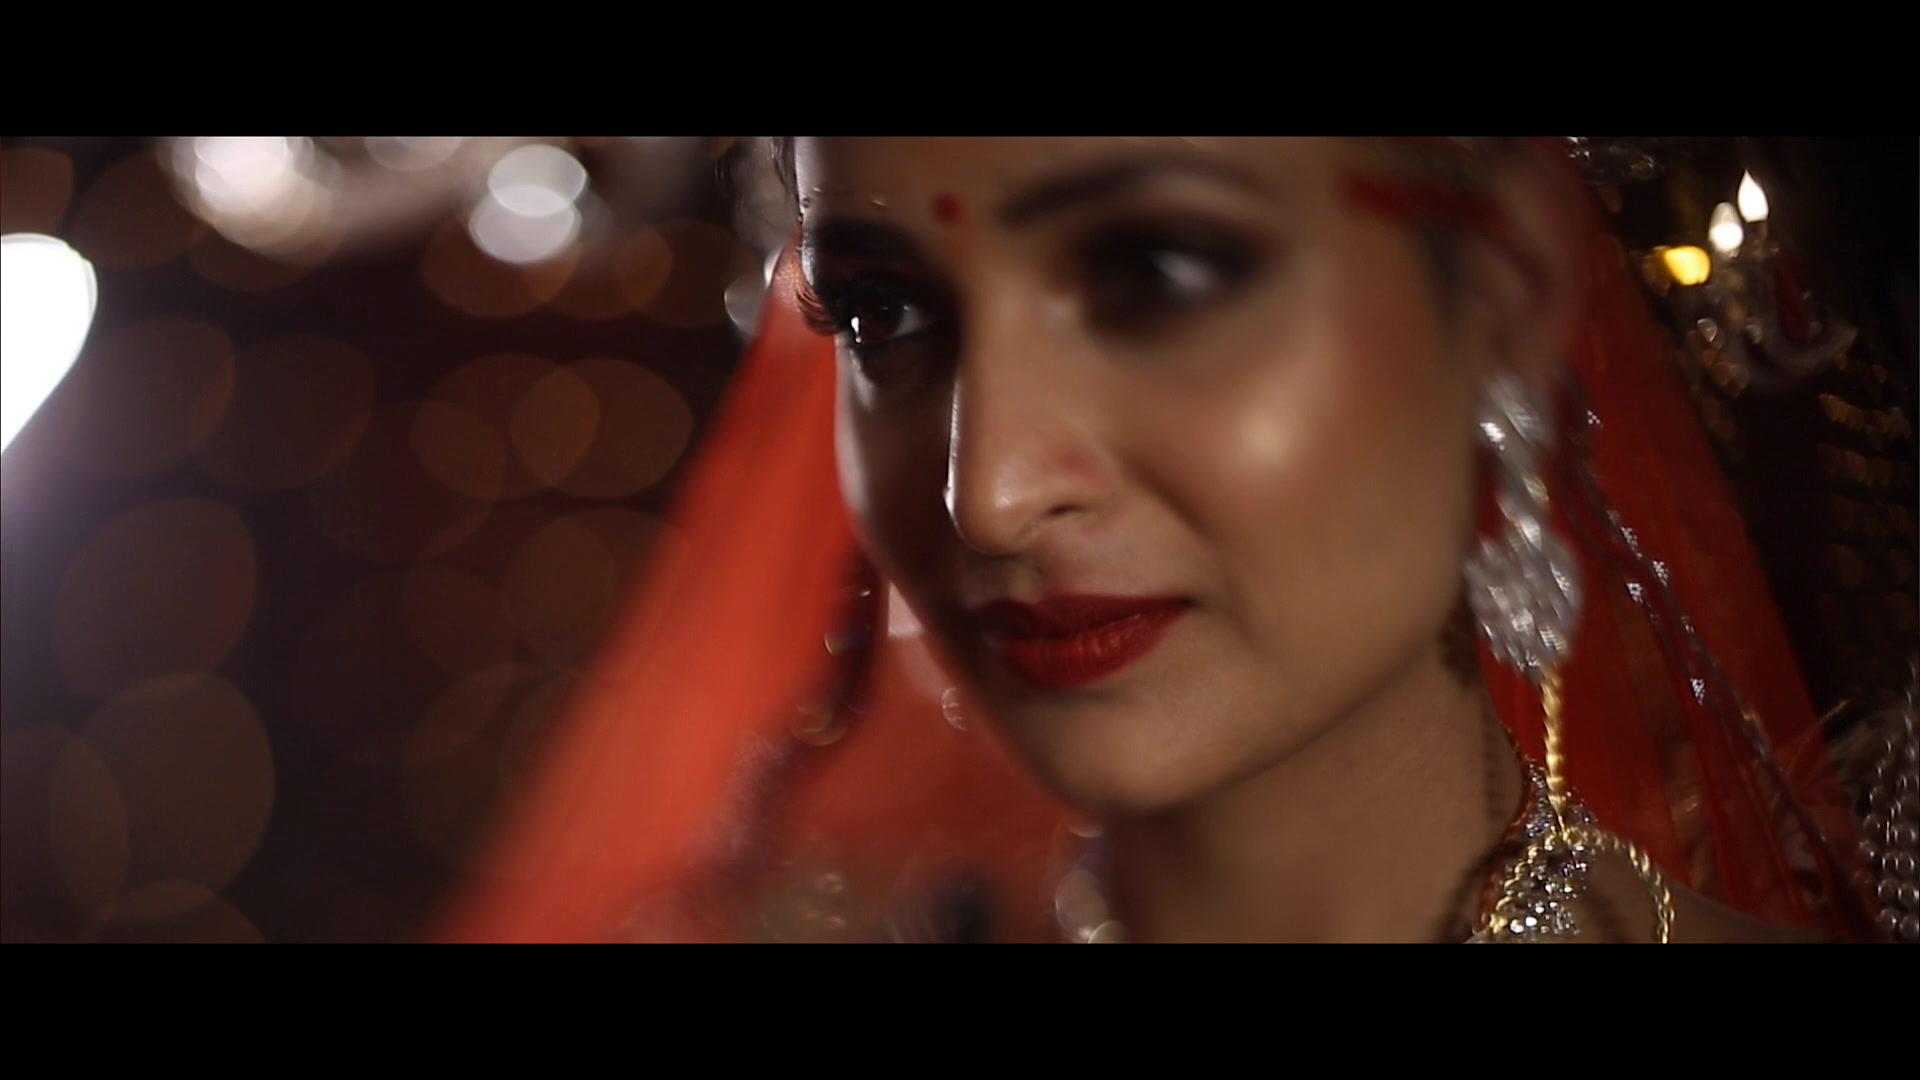 Nandini + Anshul | Raipur, India | Sona Vatika